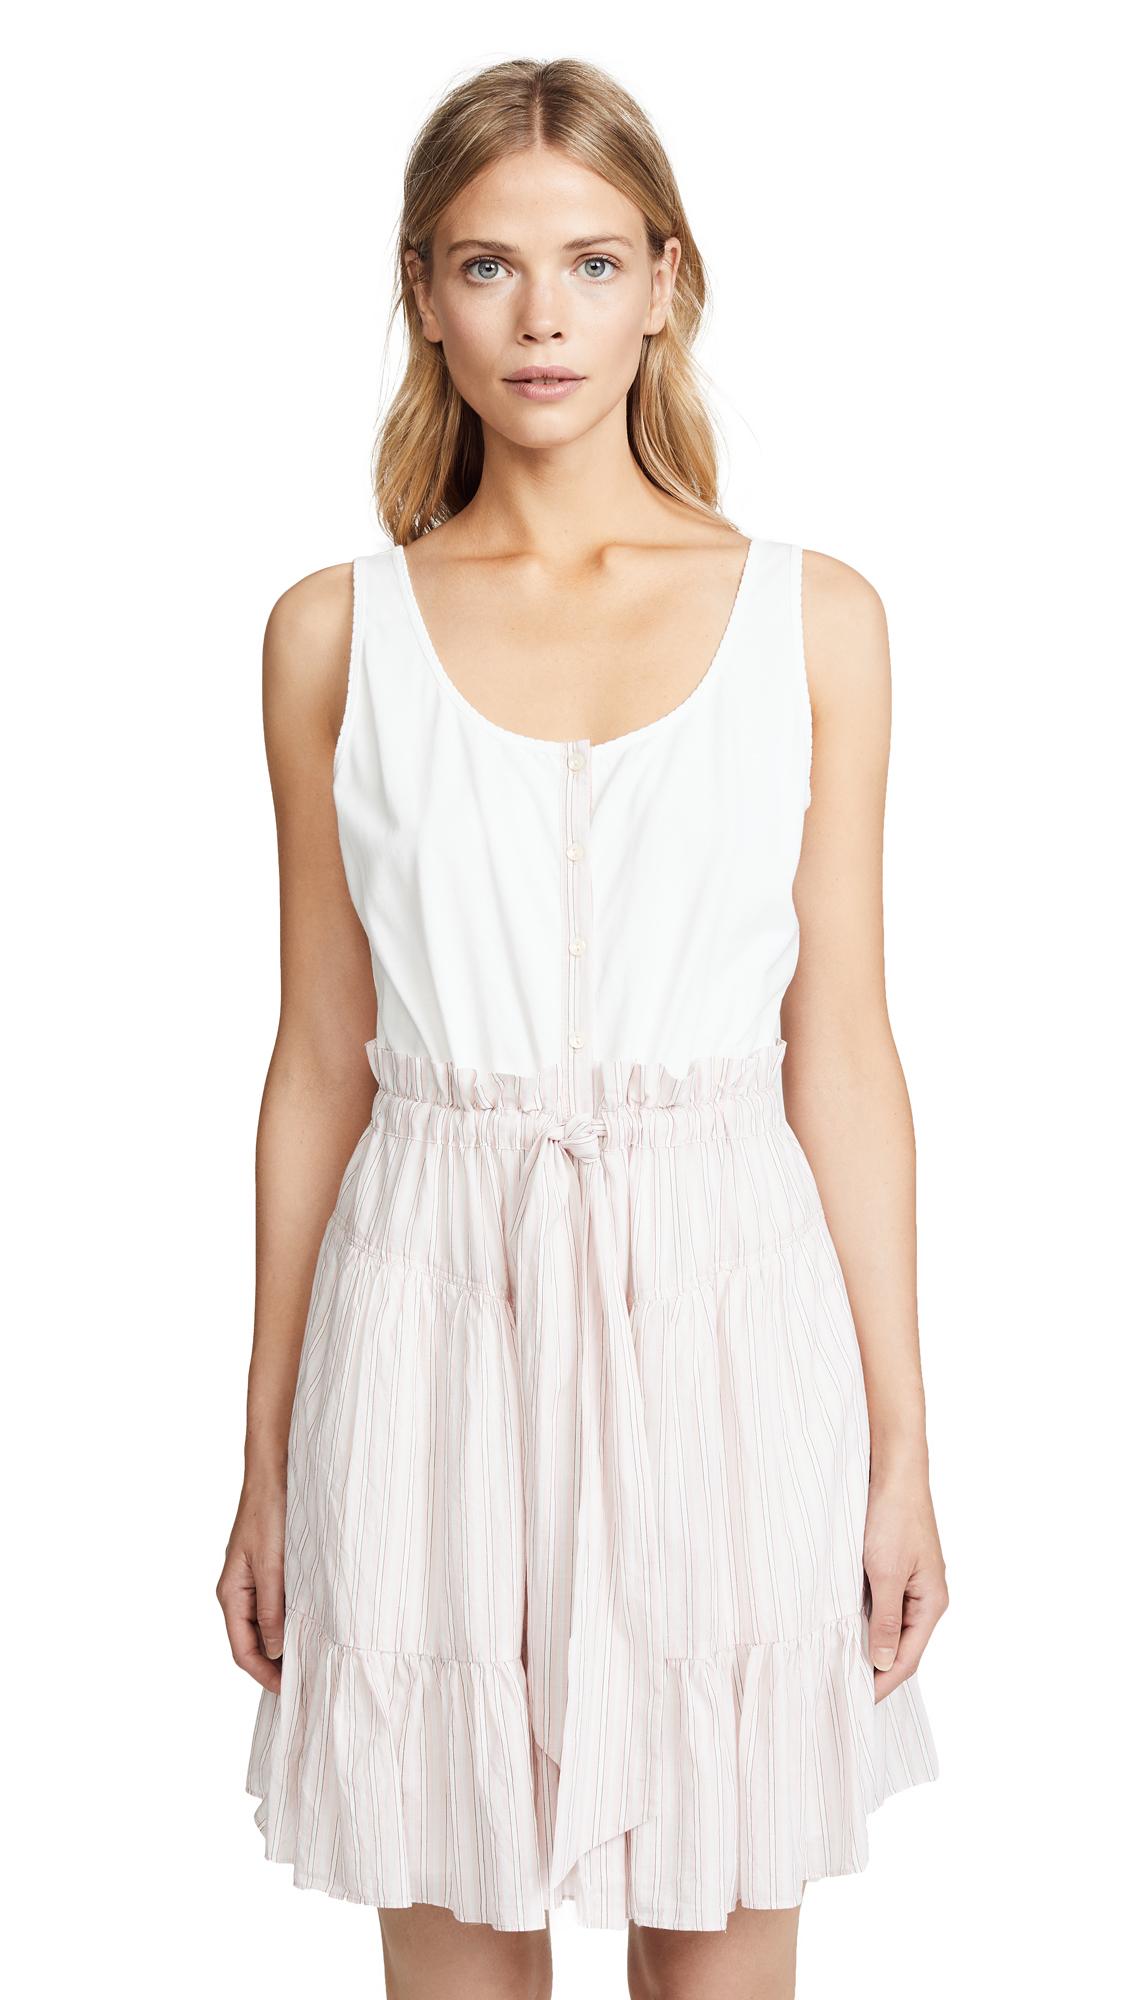 La Vie Rebecca Taylor Stripe Jersey Dress